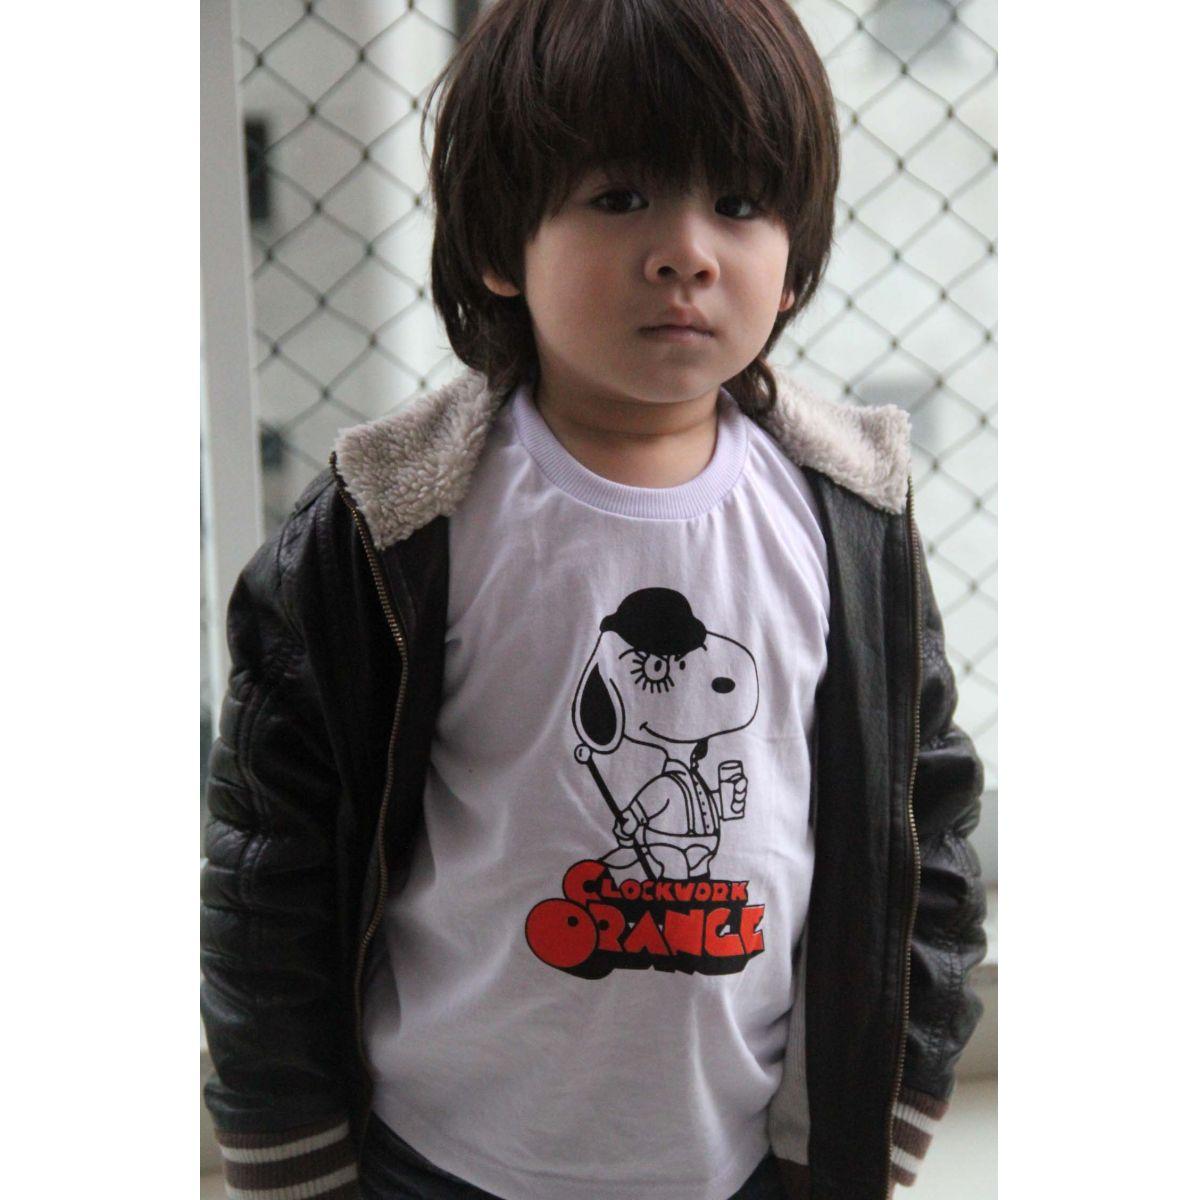 Camiseta de Filme Infantil - Laranja Mecânica - White  - Baby Monster S/A